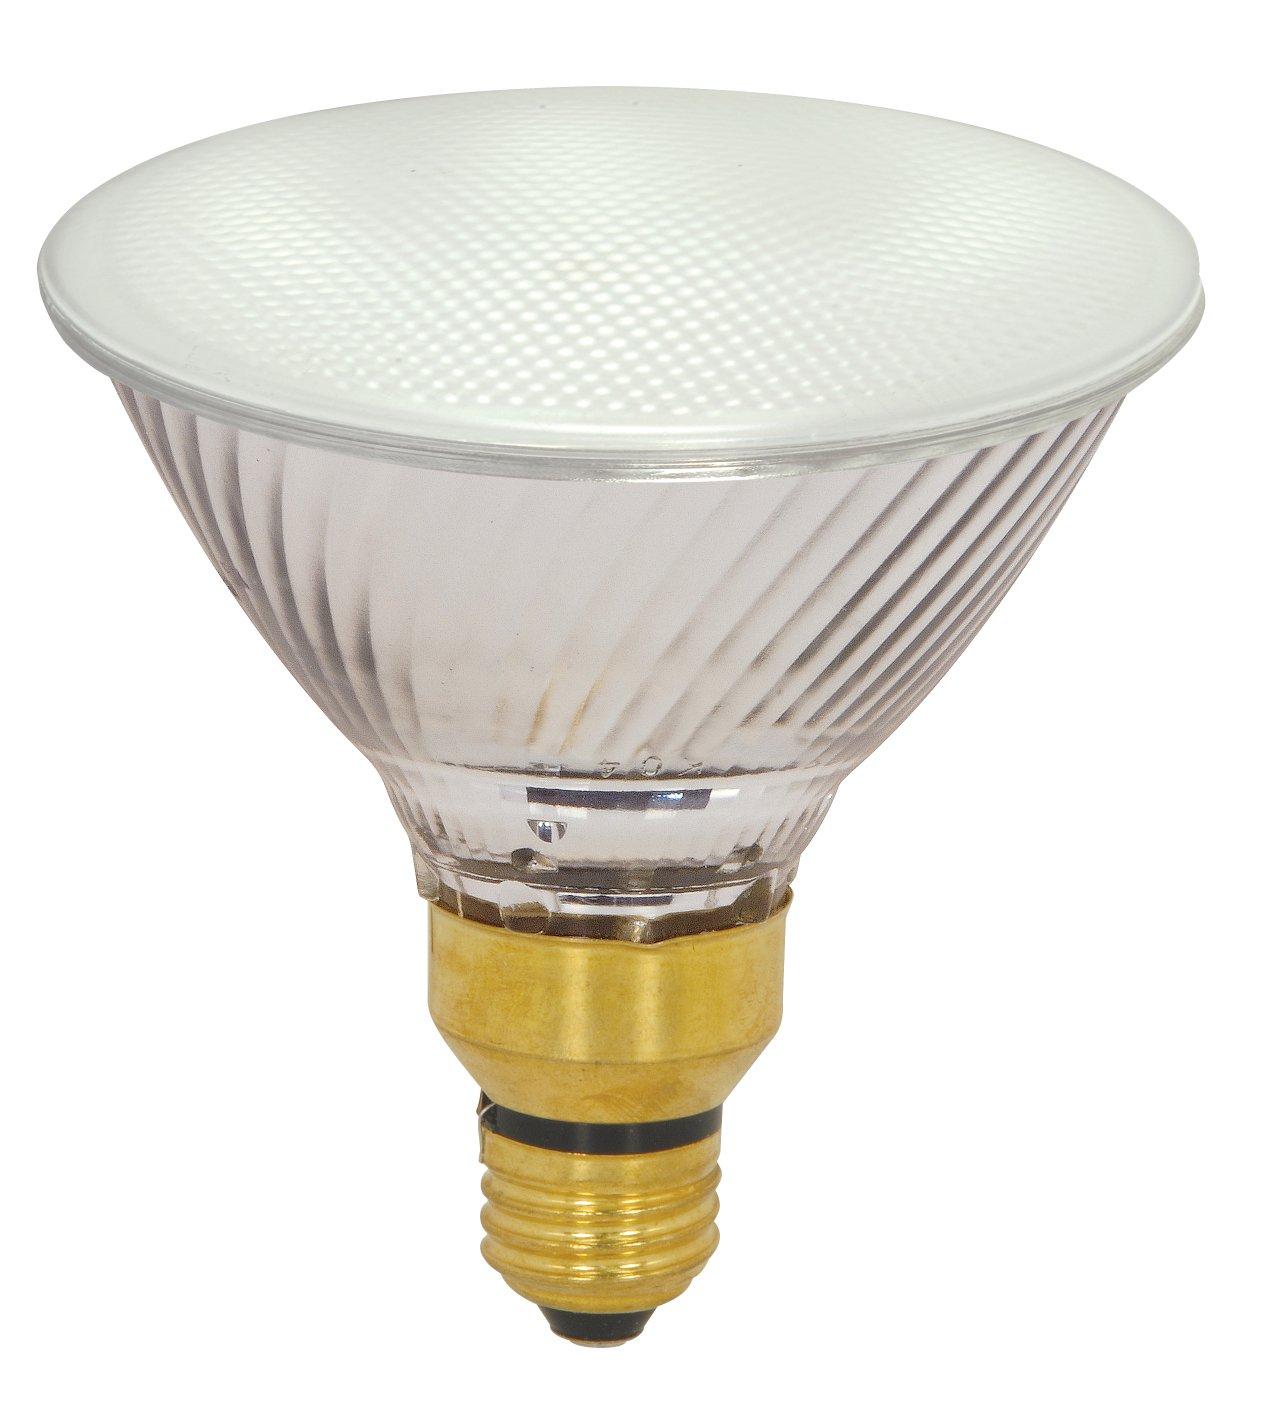 Satco Products S2259 80-Watt (120-Watt) 1600 Lumens PAR38 Halogen Flood 30-Degrees Clear Light Bulb, Dimmable